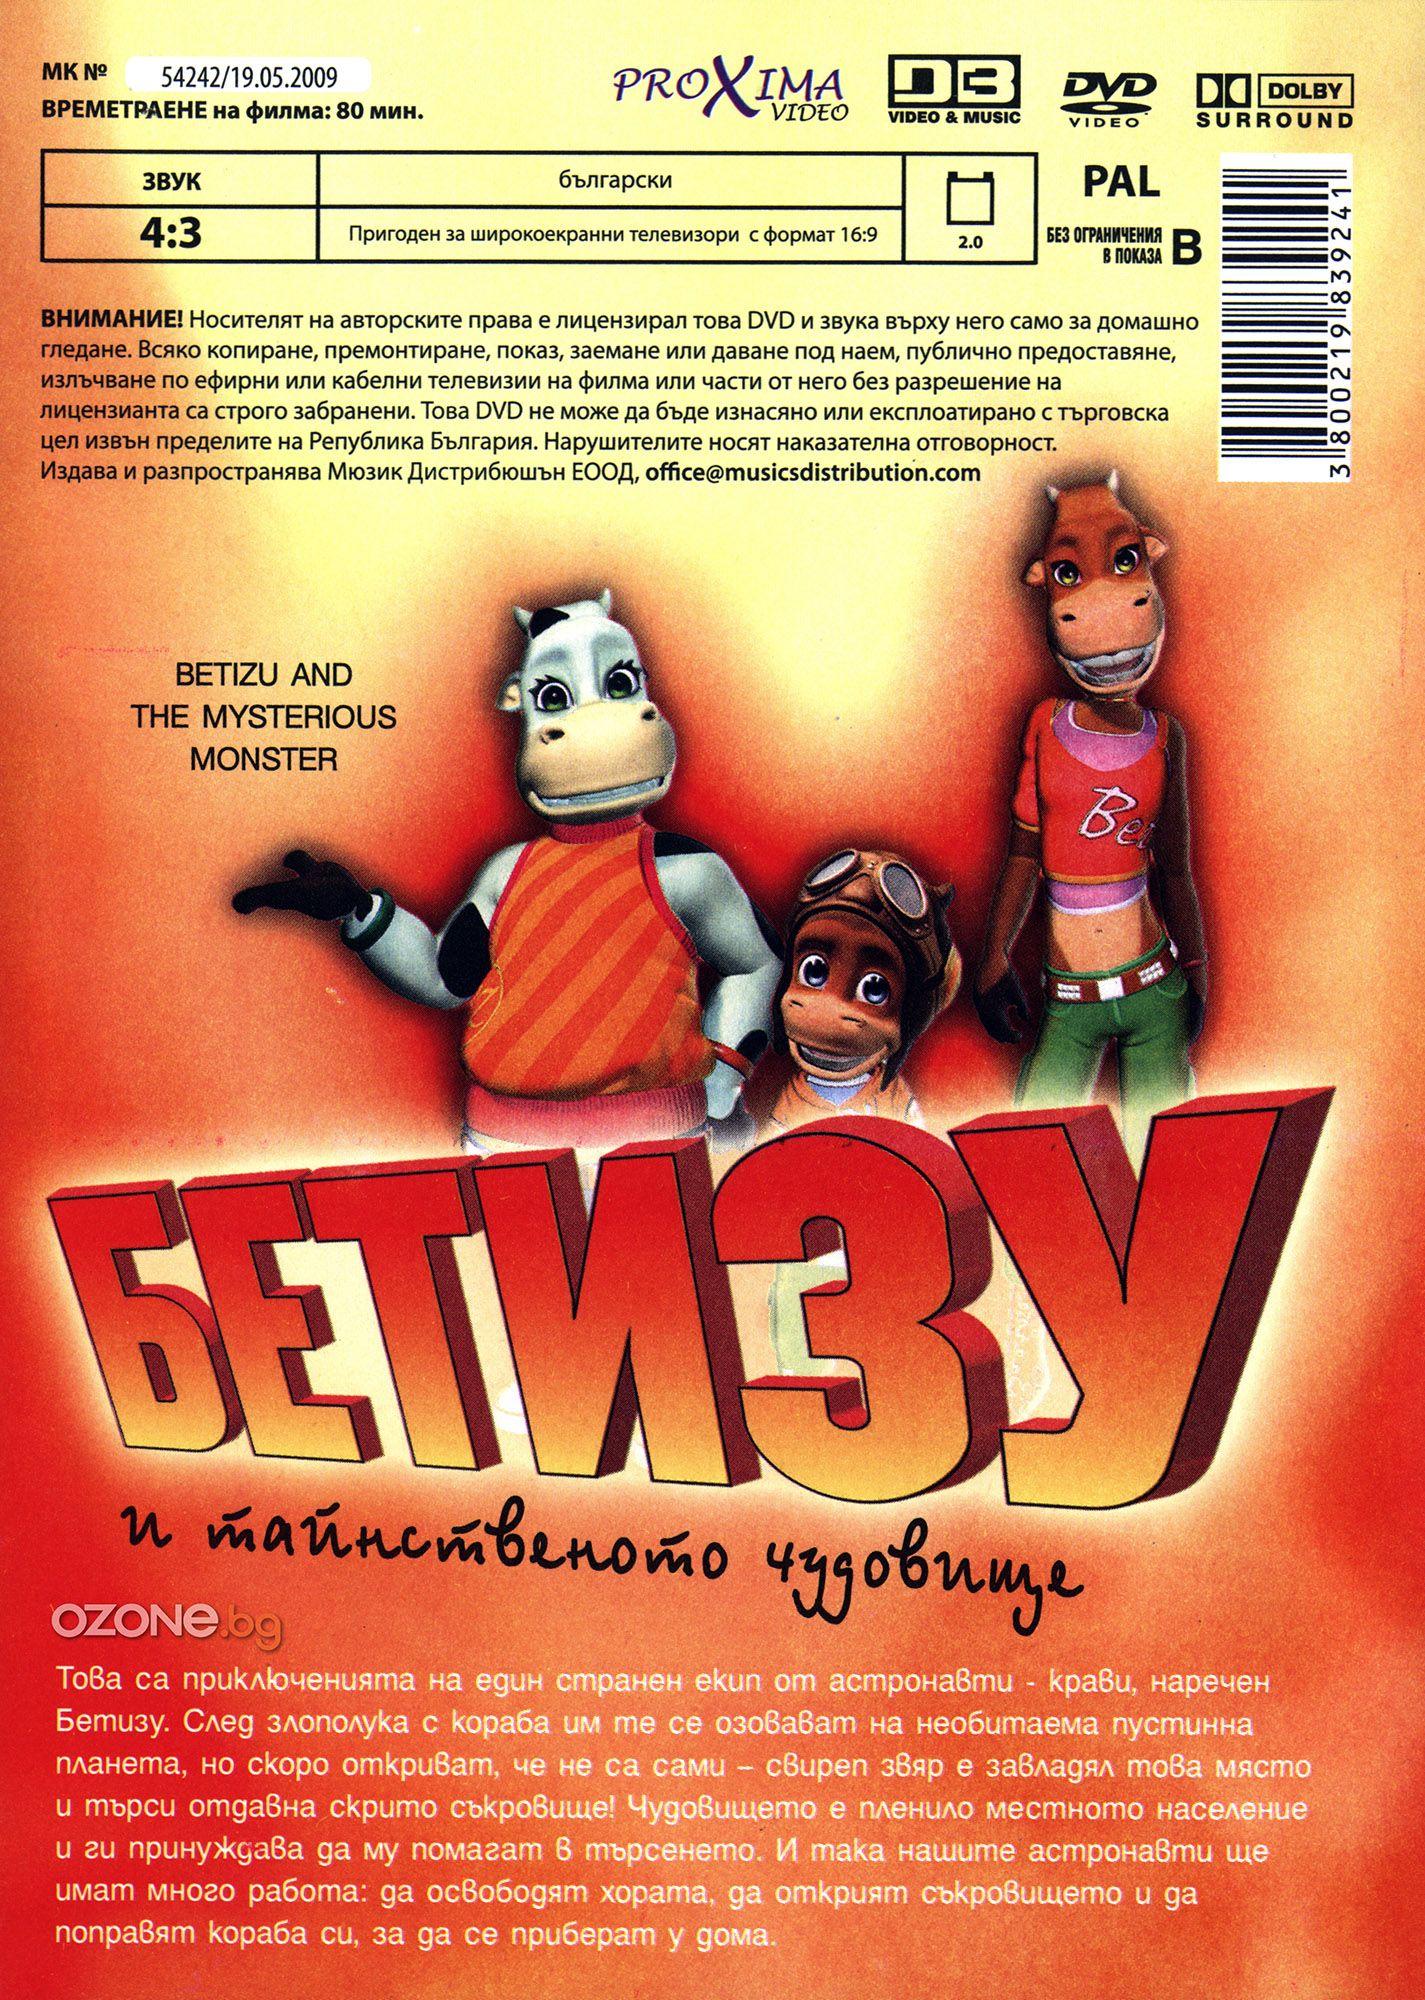 Бетизу и тайното чудовище (DVD) - 3